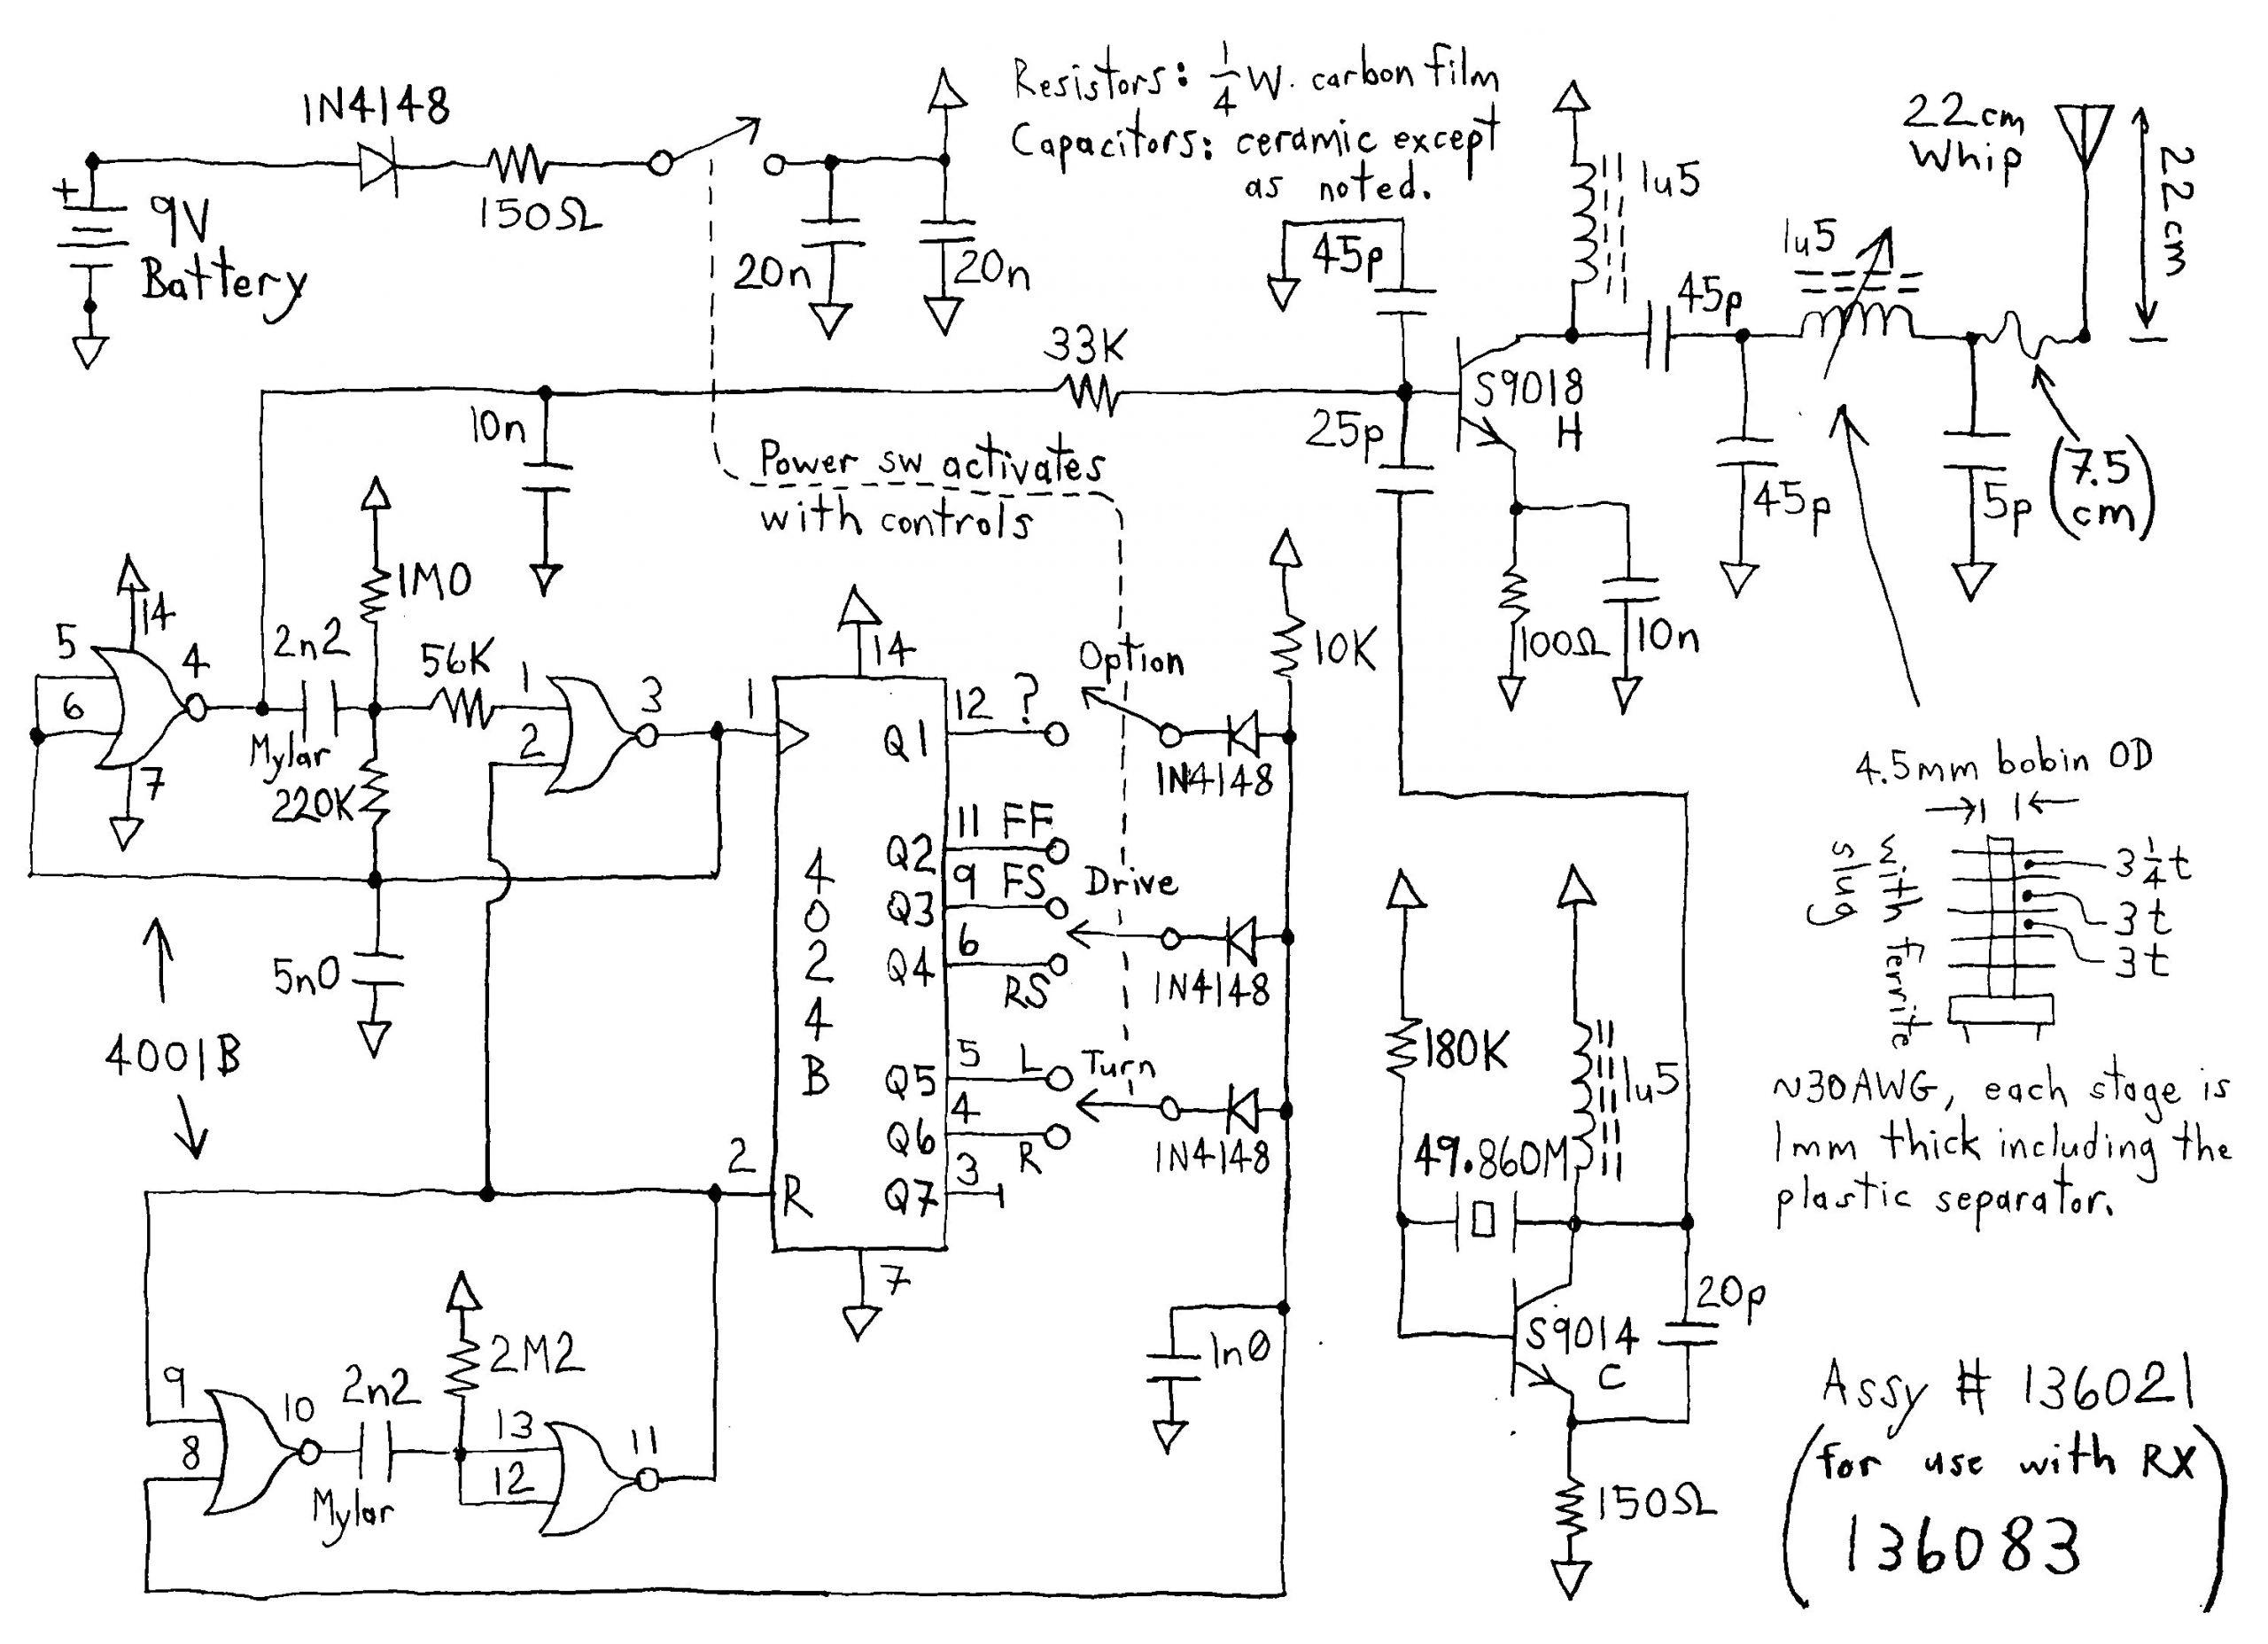 2005 jeep liberty wiring diagram inspirational 04 jeep liberty resistor diagram jeep wiring diagrams instructions of 2005 jeep liberty wiring diagram jpg